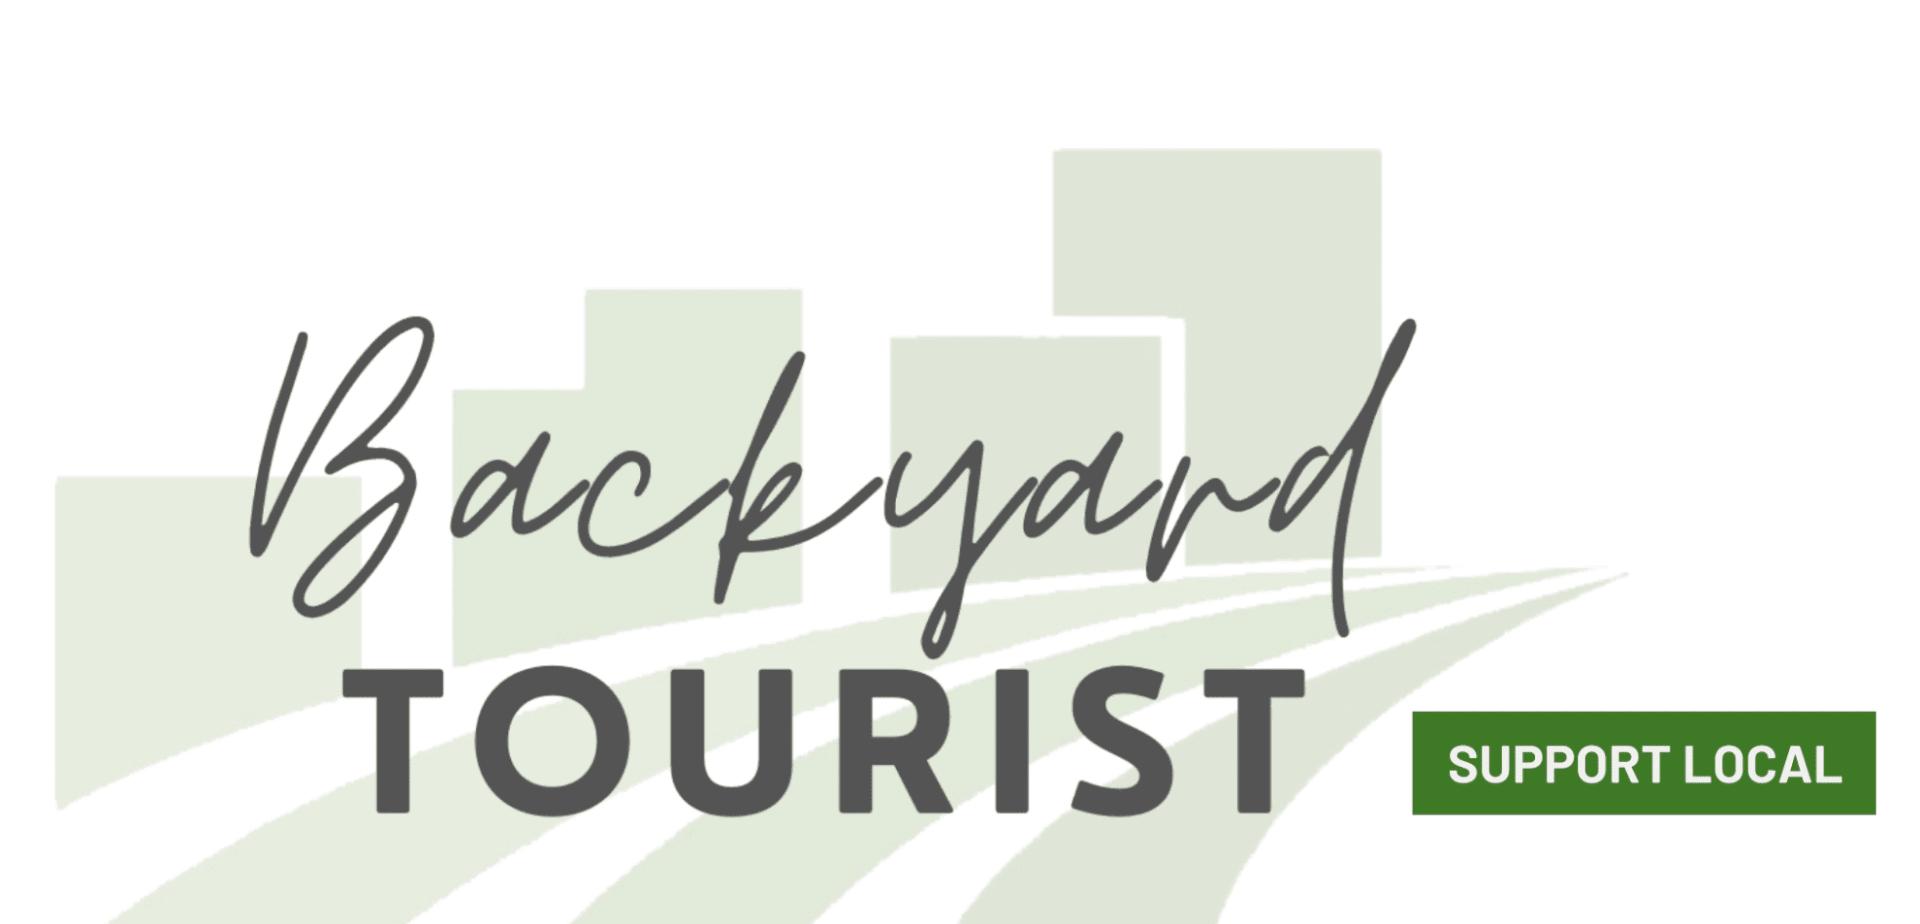 Backyard-Tourist-web-header-w1920.png